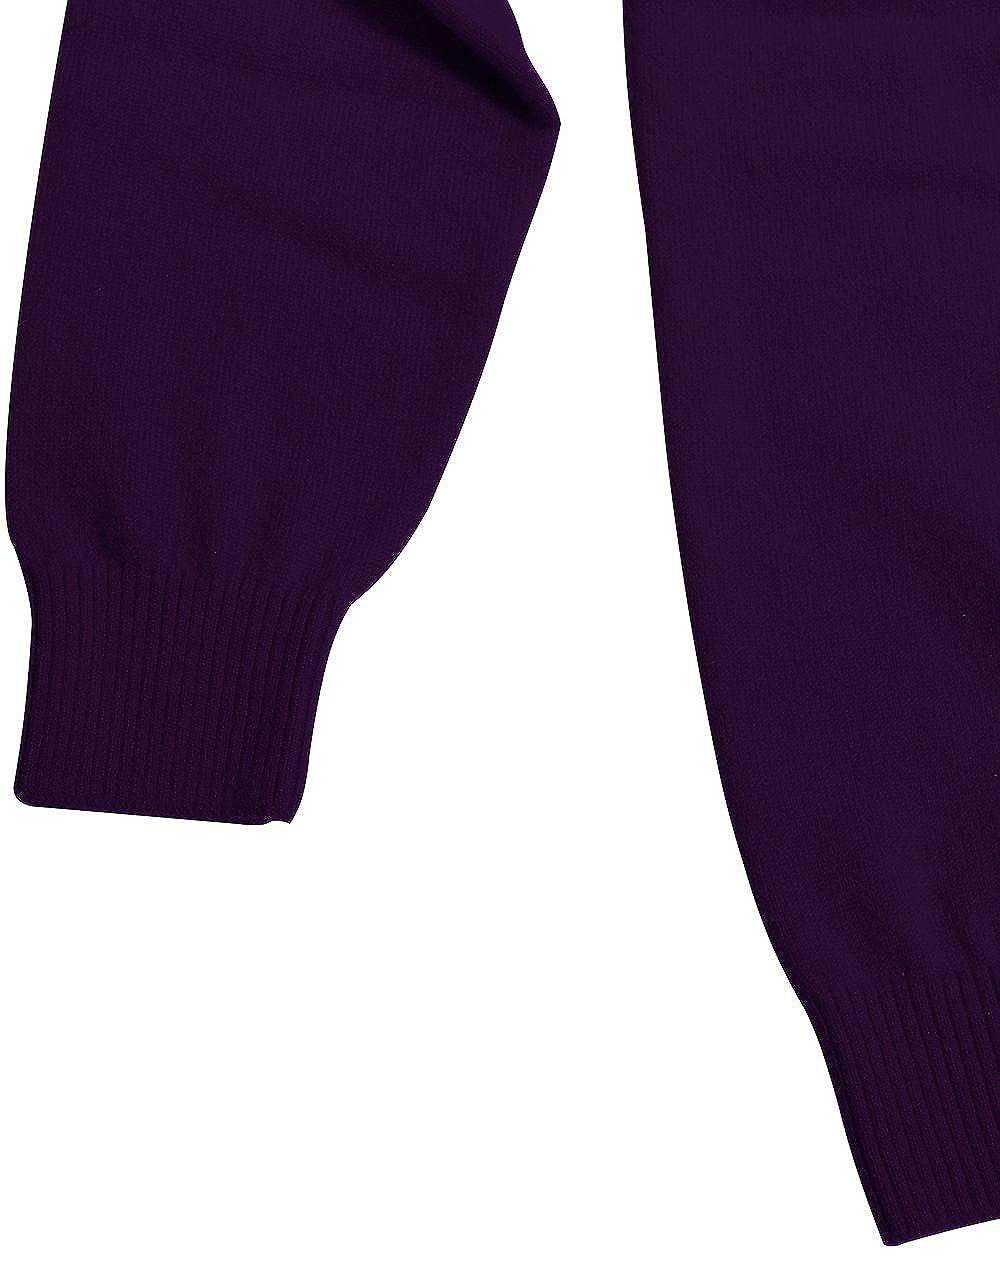 CHARXI Mens Double Pure Cashmere Crew Neck Cardigan Sweater Customizable